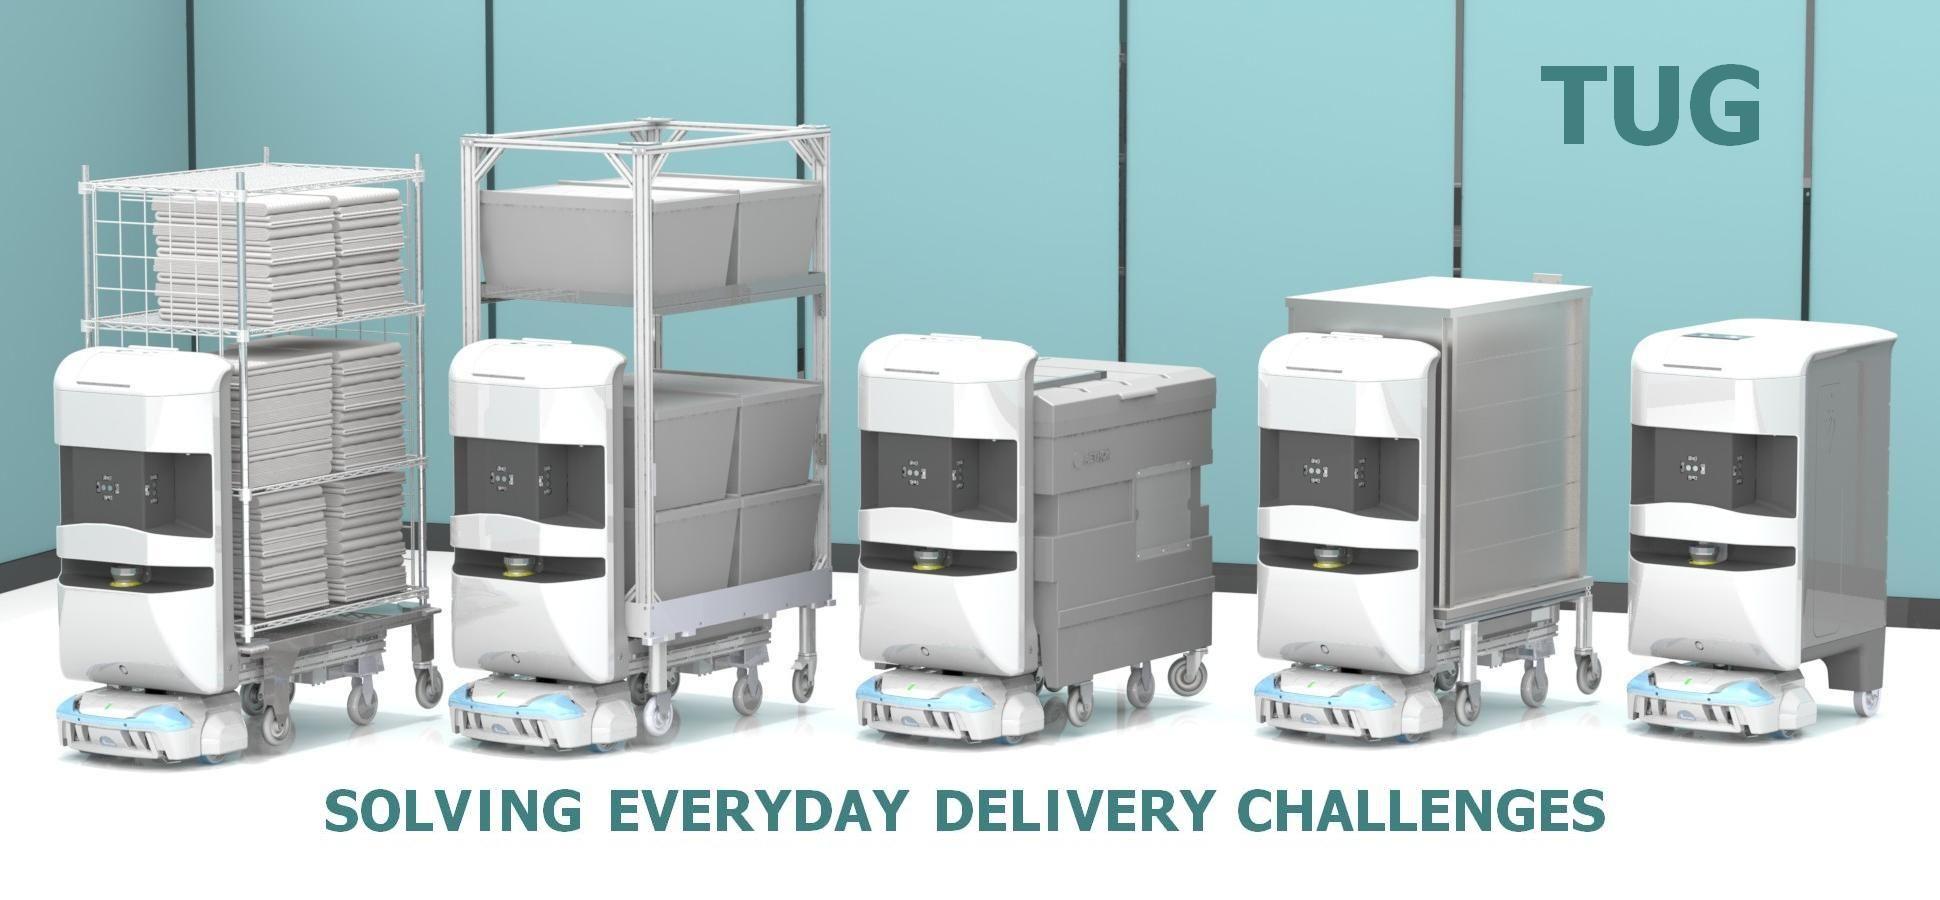 TUG robots used for hospital materials management (med